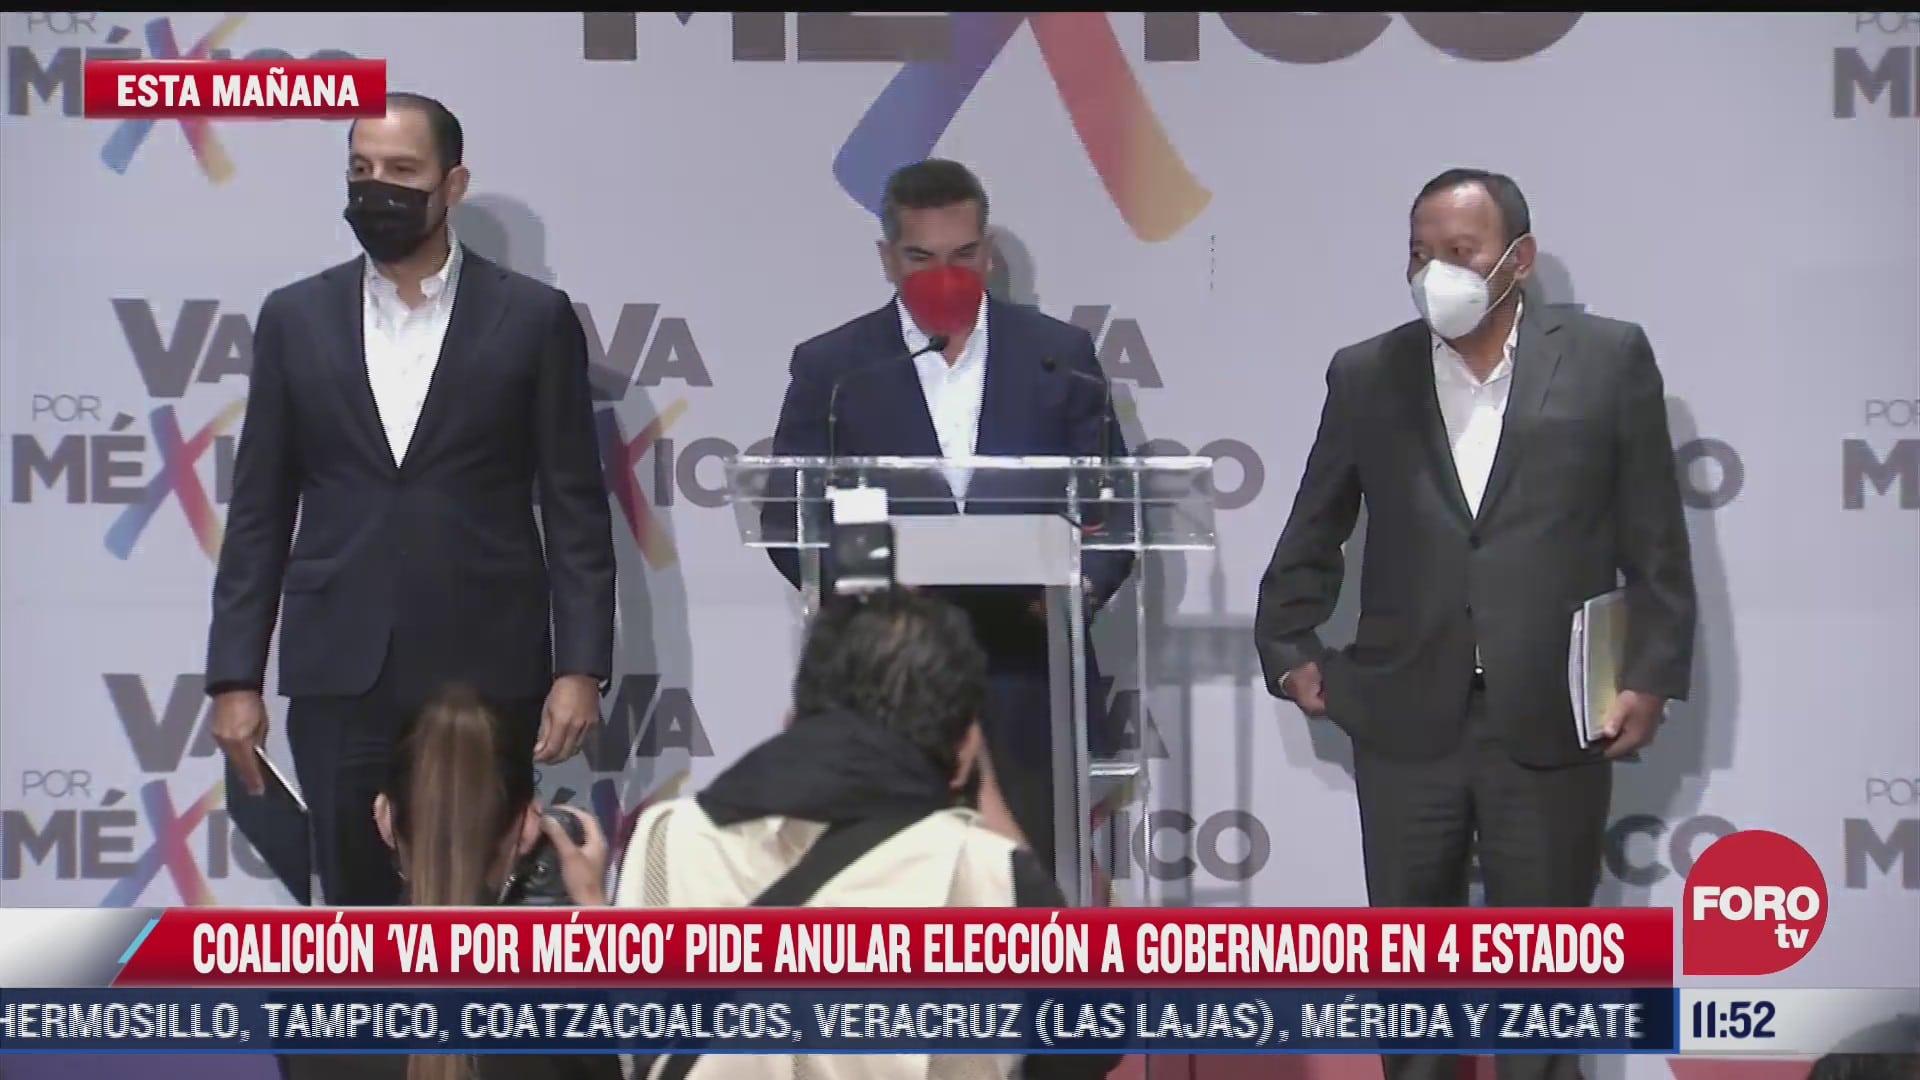 coalicion va por mexico pide anular eleccion a gobernador en cuatro estados